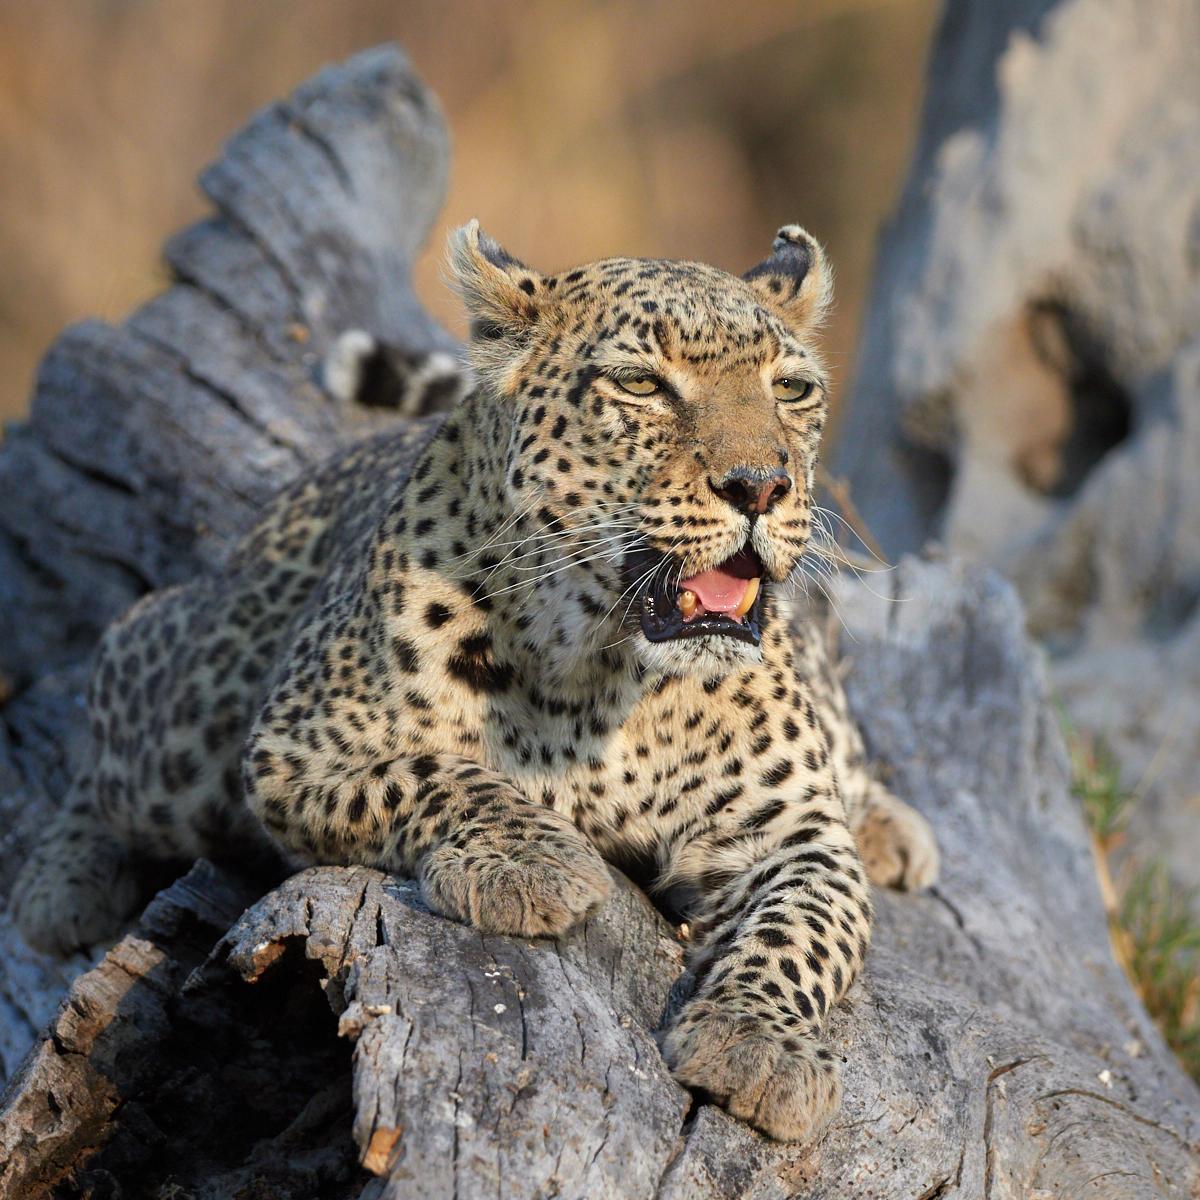 Leopardess on the log 1600x1200 sRGB.jpg